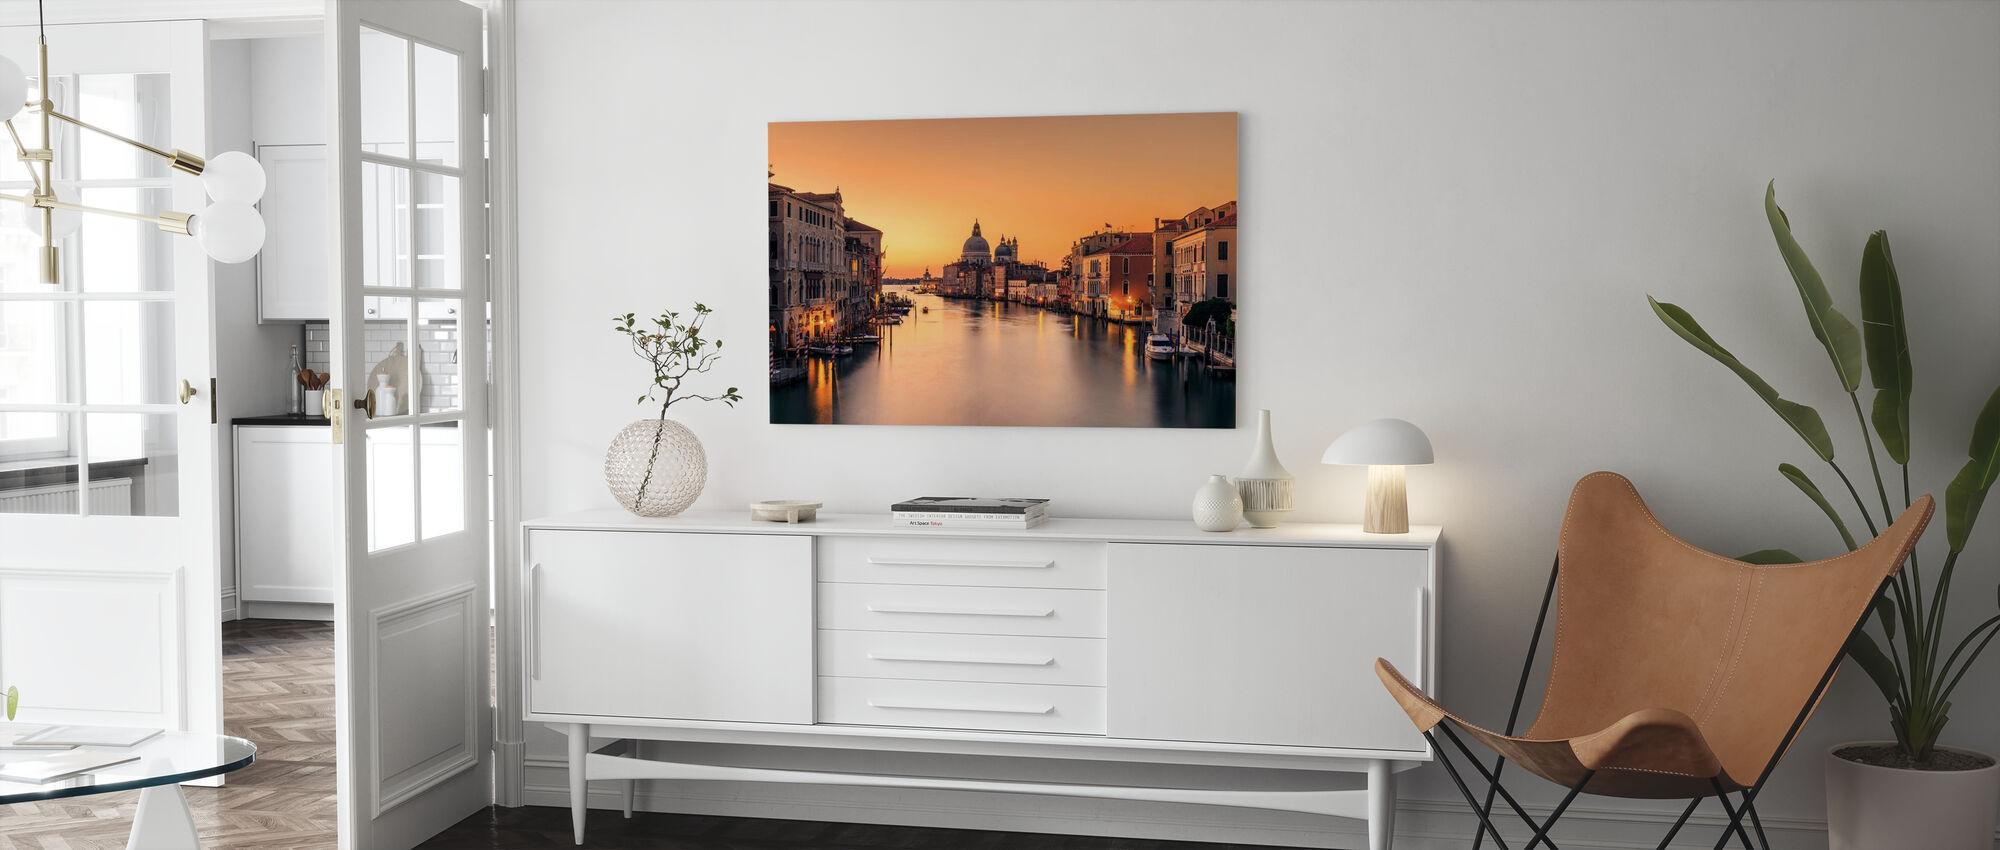 Dawn on Venice - Canvas print - Living Room